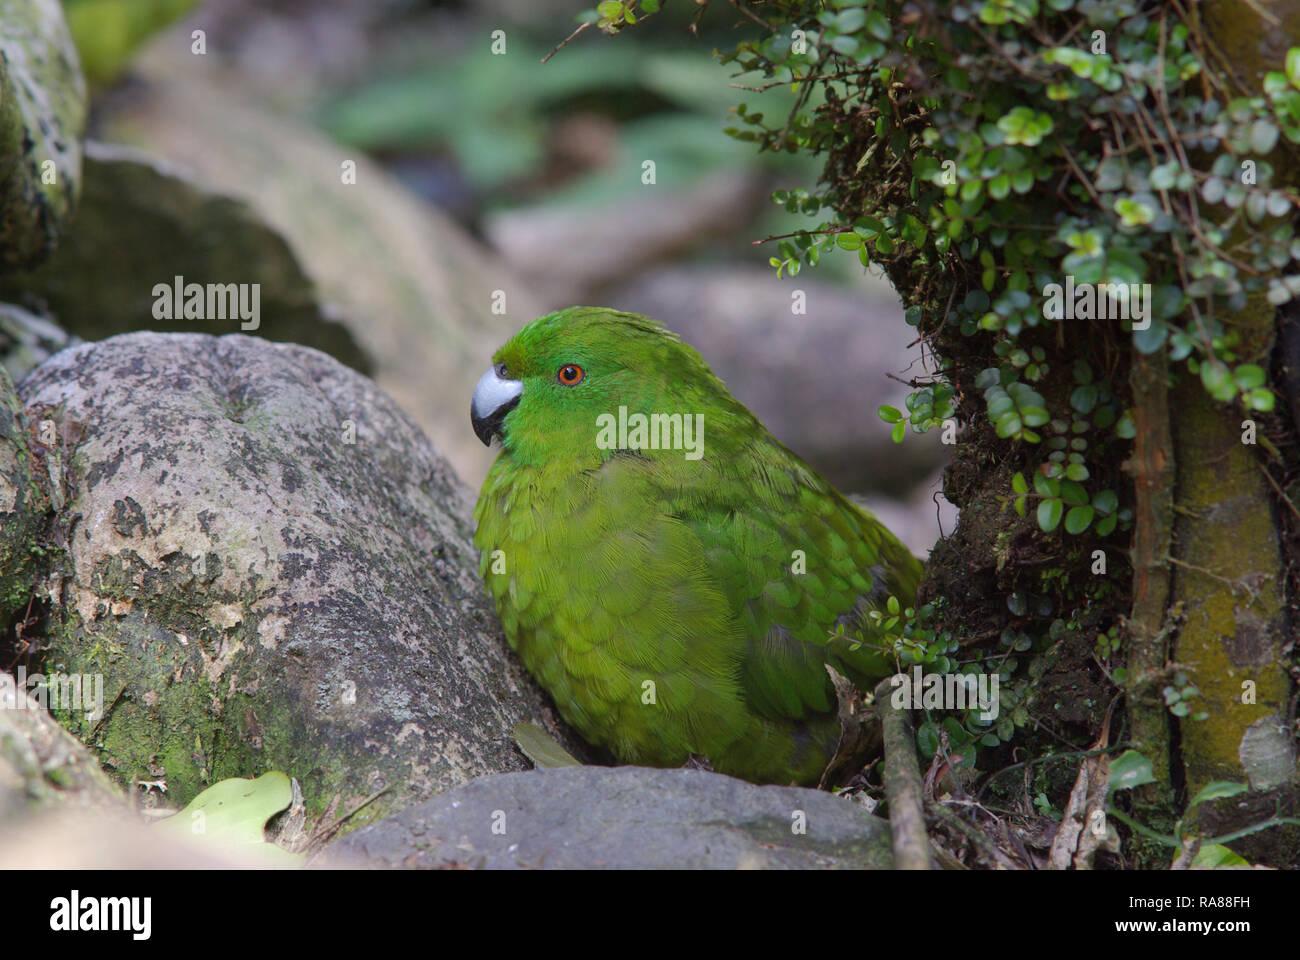 Antipodes Island parakeet, Cyanoramphus unicolor - Stock Image